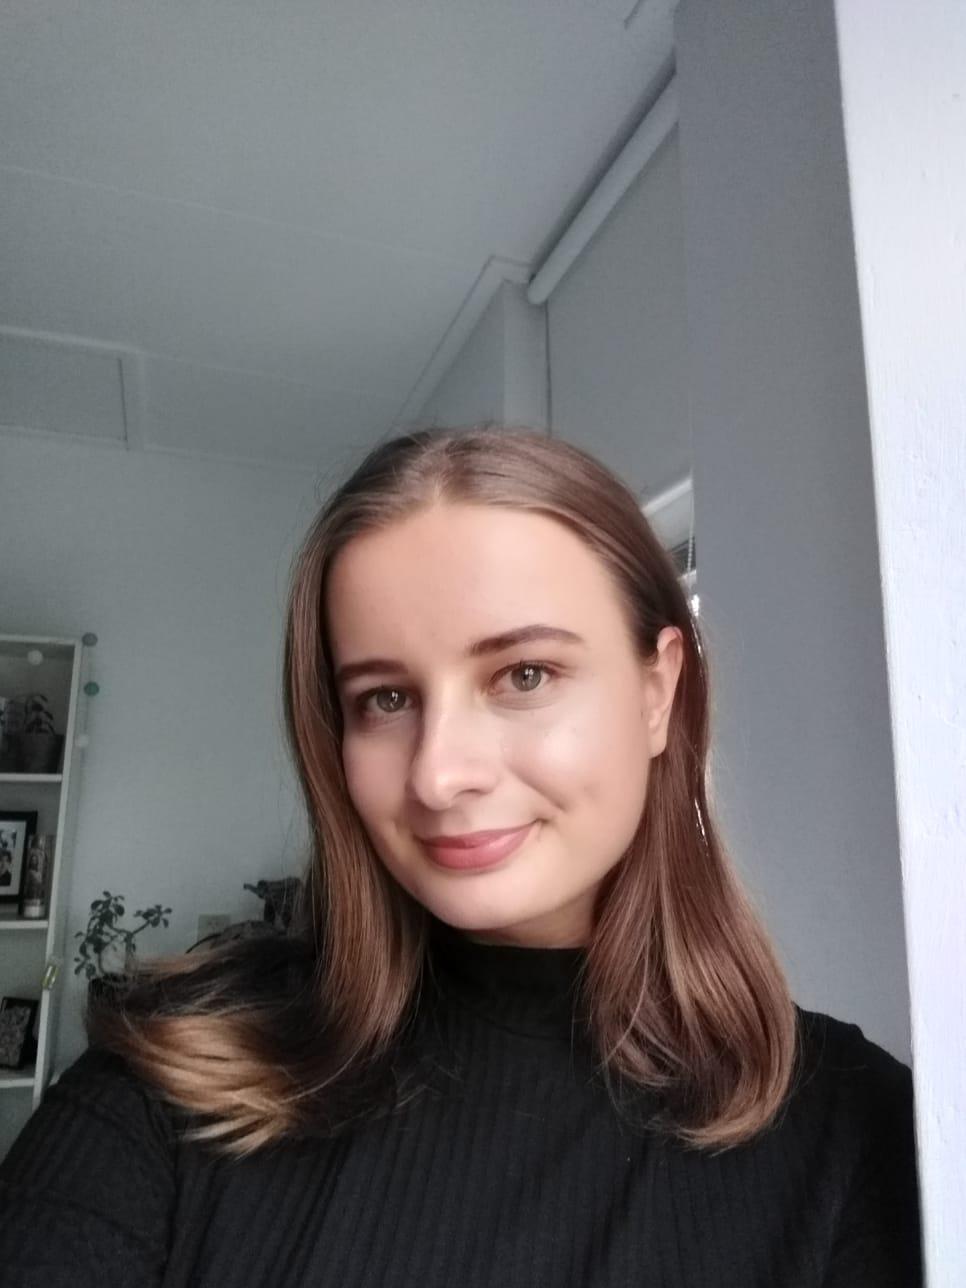 noellerose's profile picture